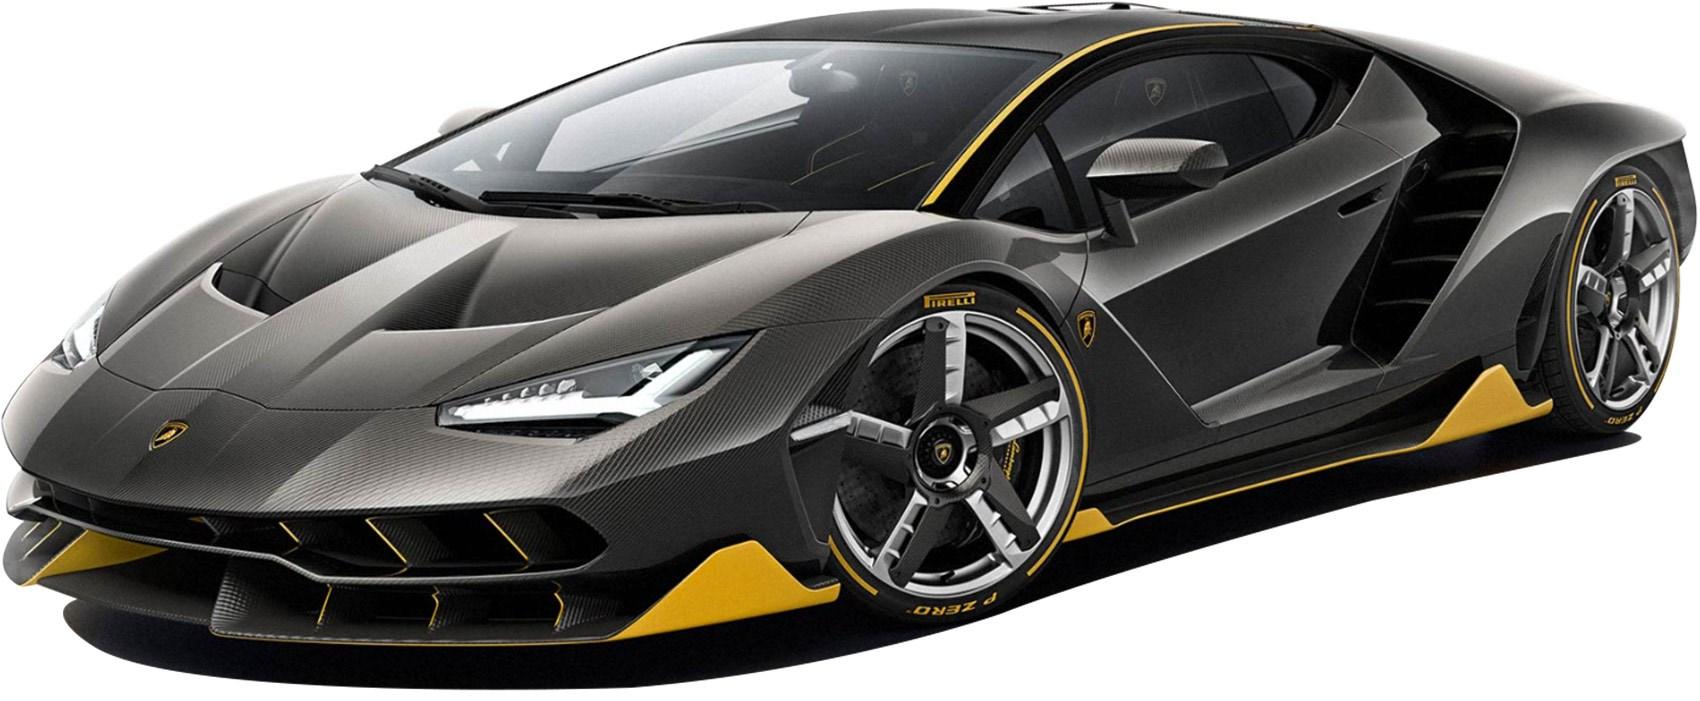 Go Green Leasing >> Winkelmann's parting gift: the Lamborghini Centenario